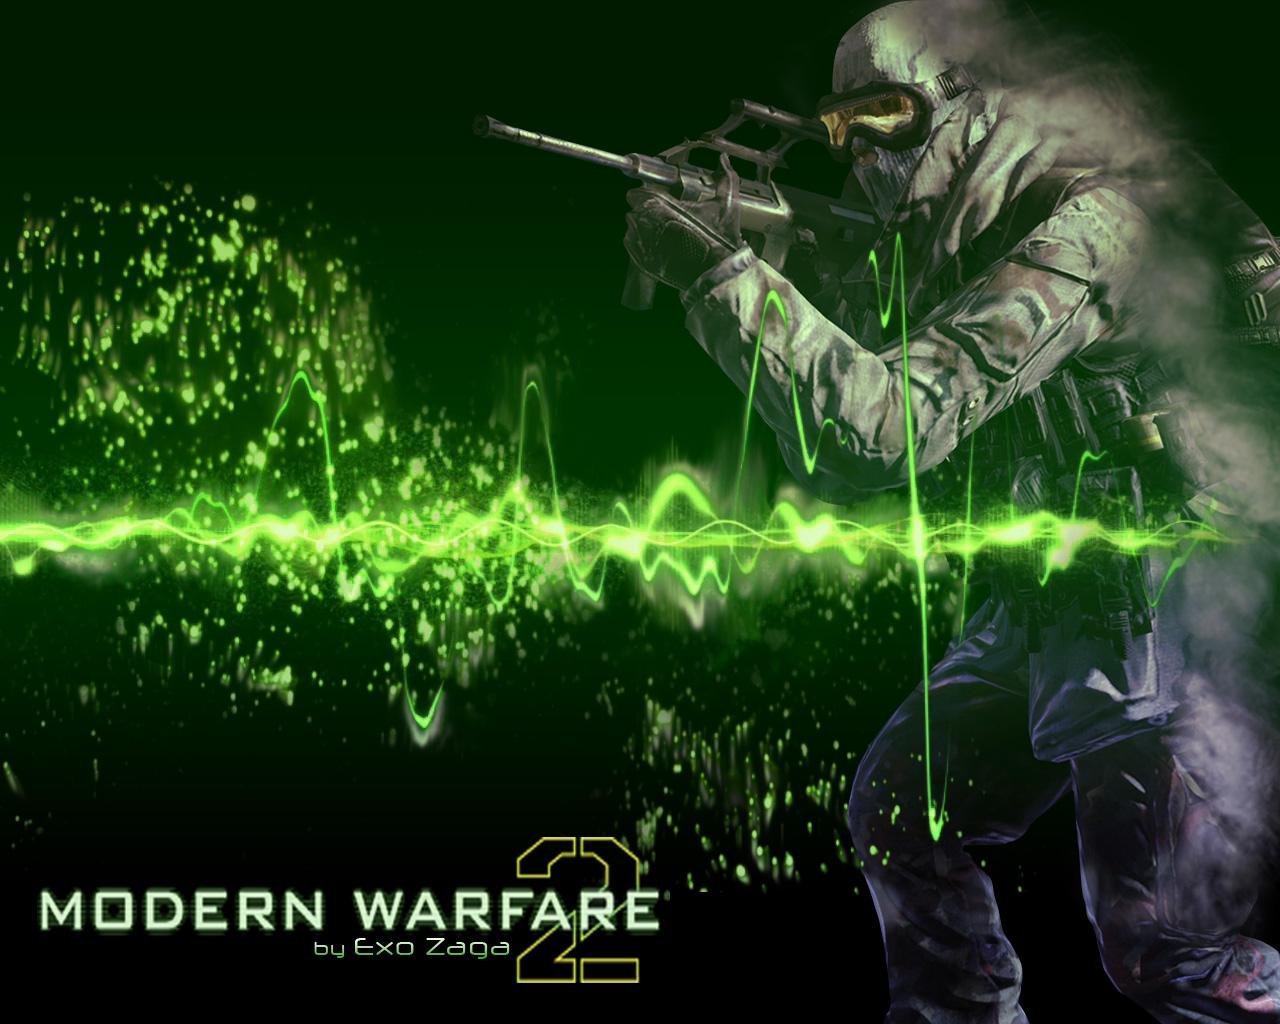 http://1.bp.blogspot.com/-lPtzfz0sCoo/TnYVSoLiBfI/AAAAAAAABq8/LGa4JLCXpGg/s1600/modern-warfare-3-wallpaper-aim.jpg